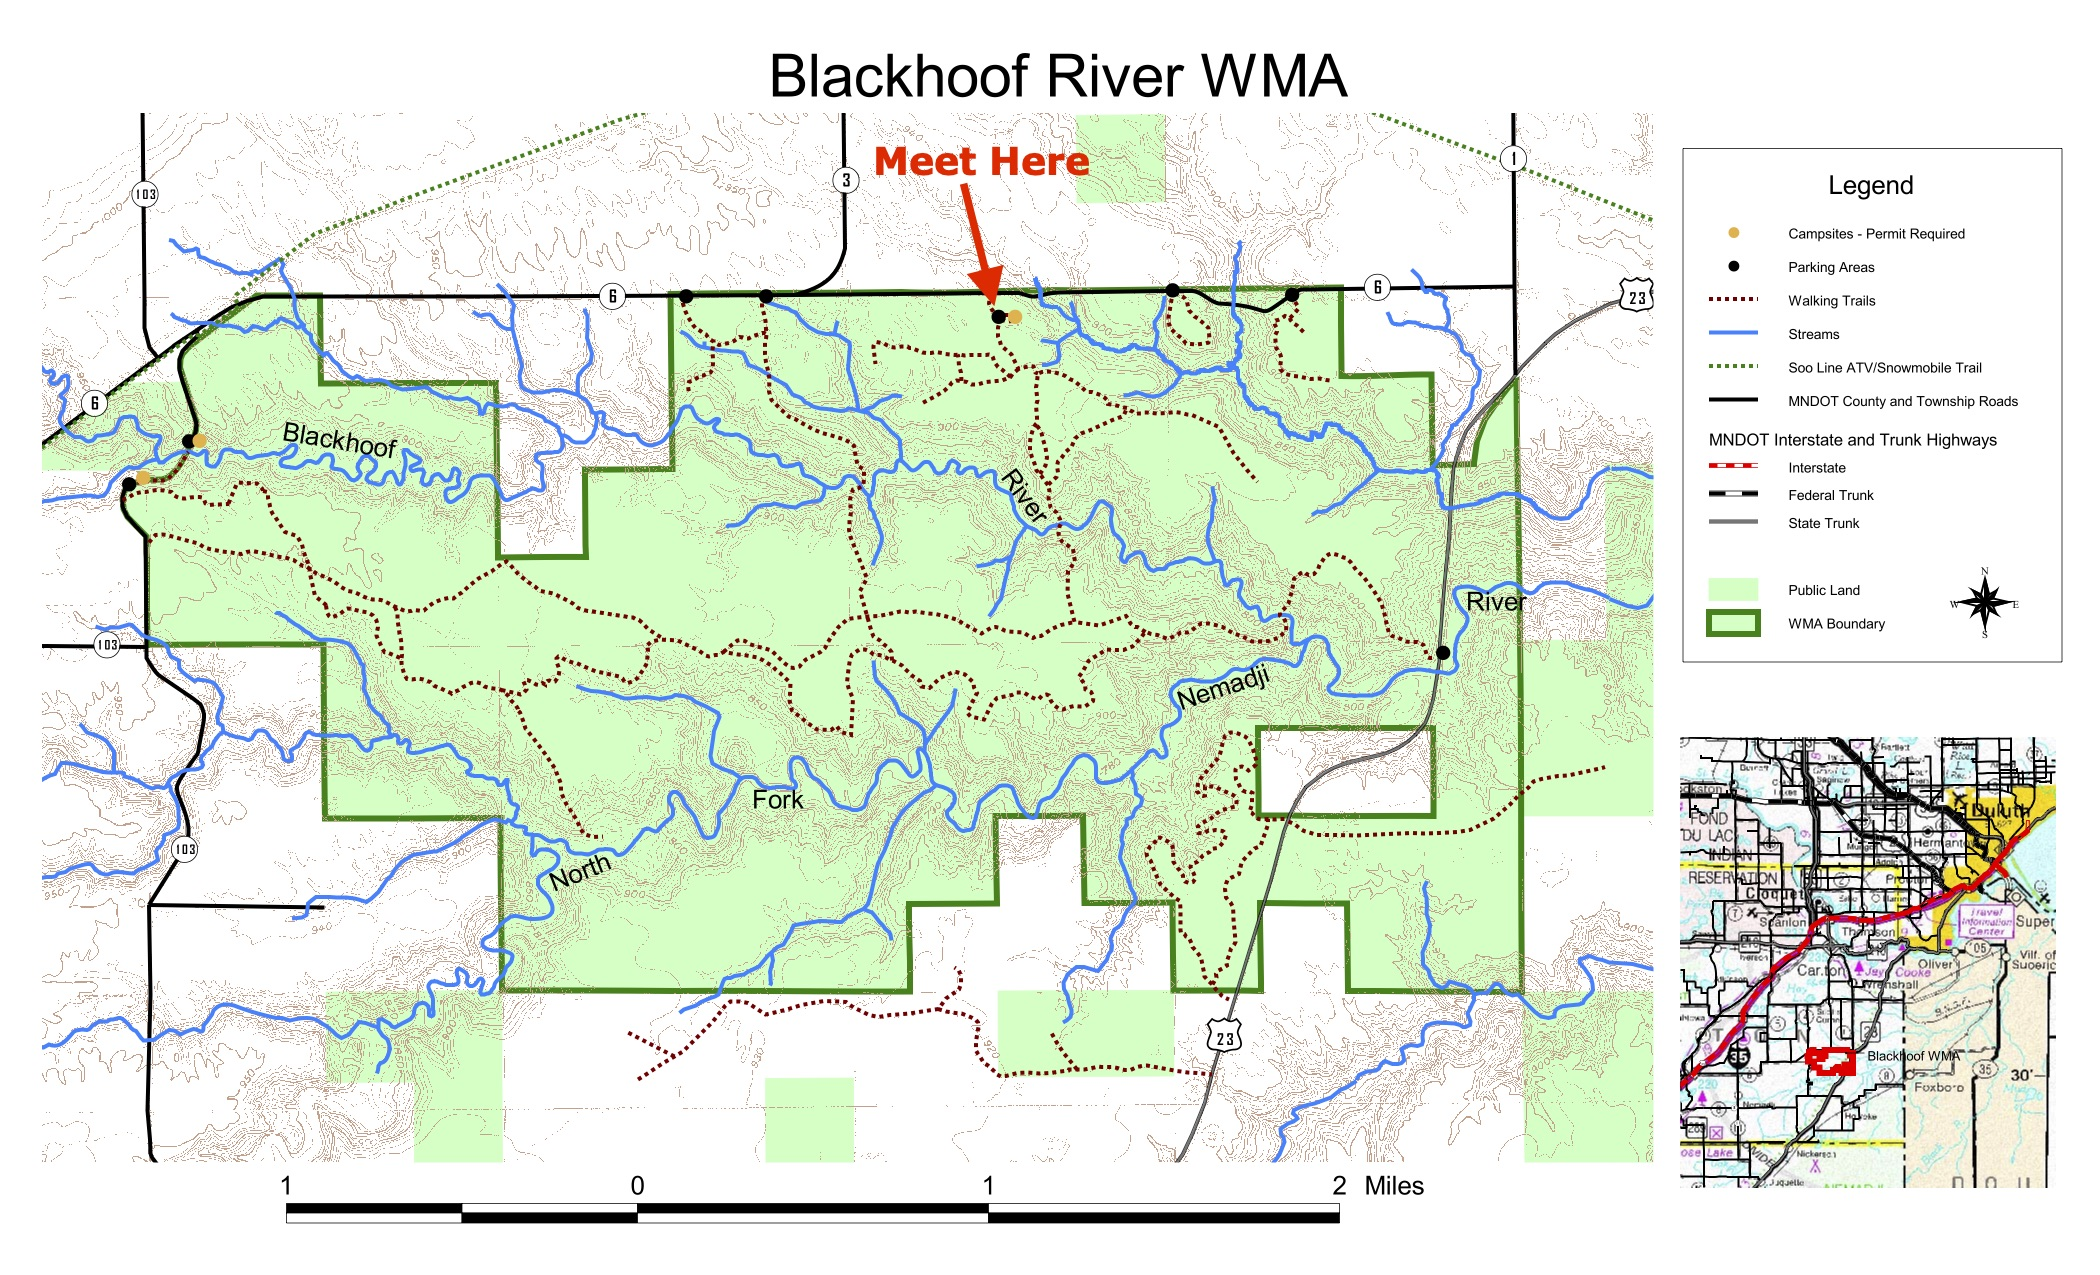 Blackhoof_River_WMA_Map.jpg